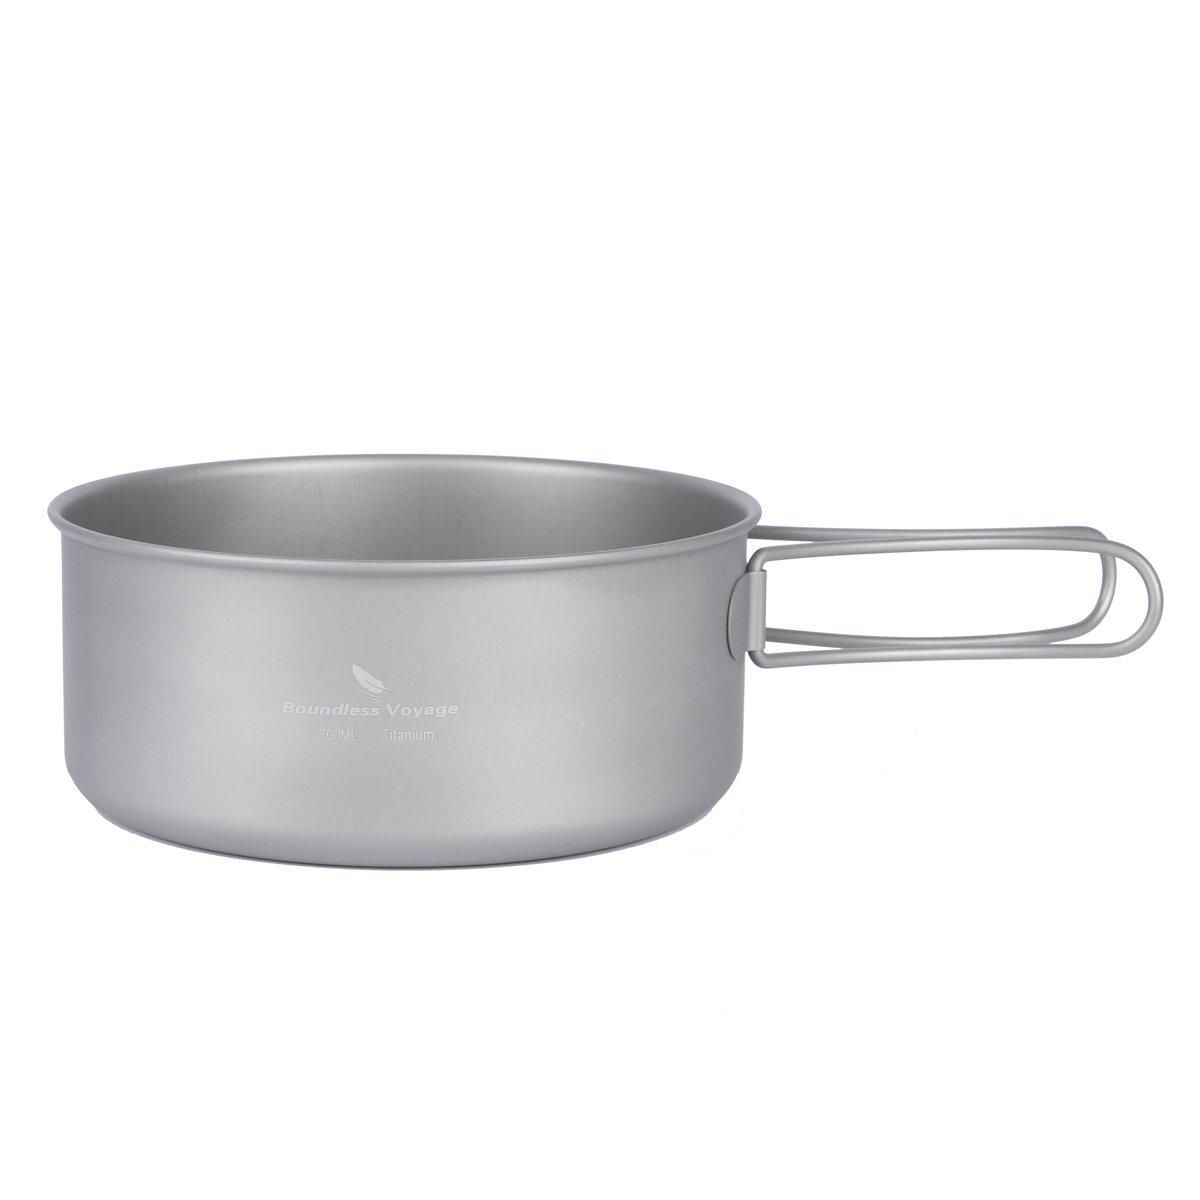 Amazon.com: iBasingo - Juego de mini estufas de titanio para ...